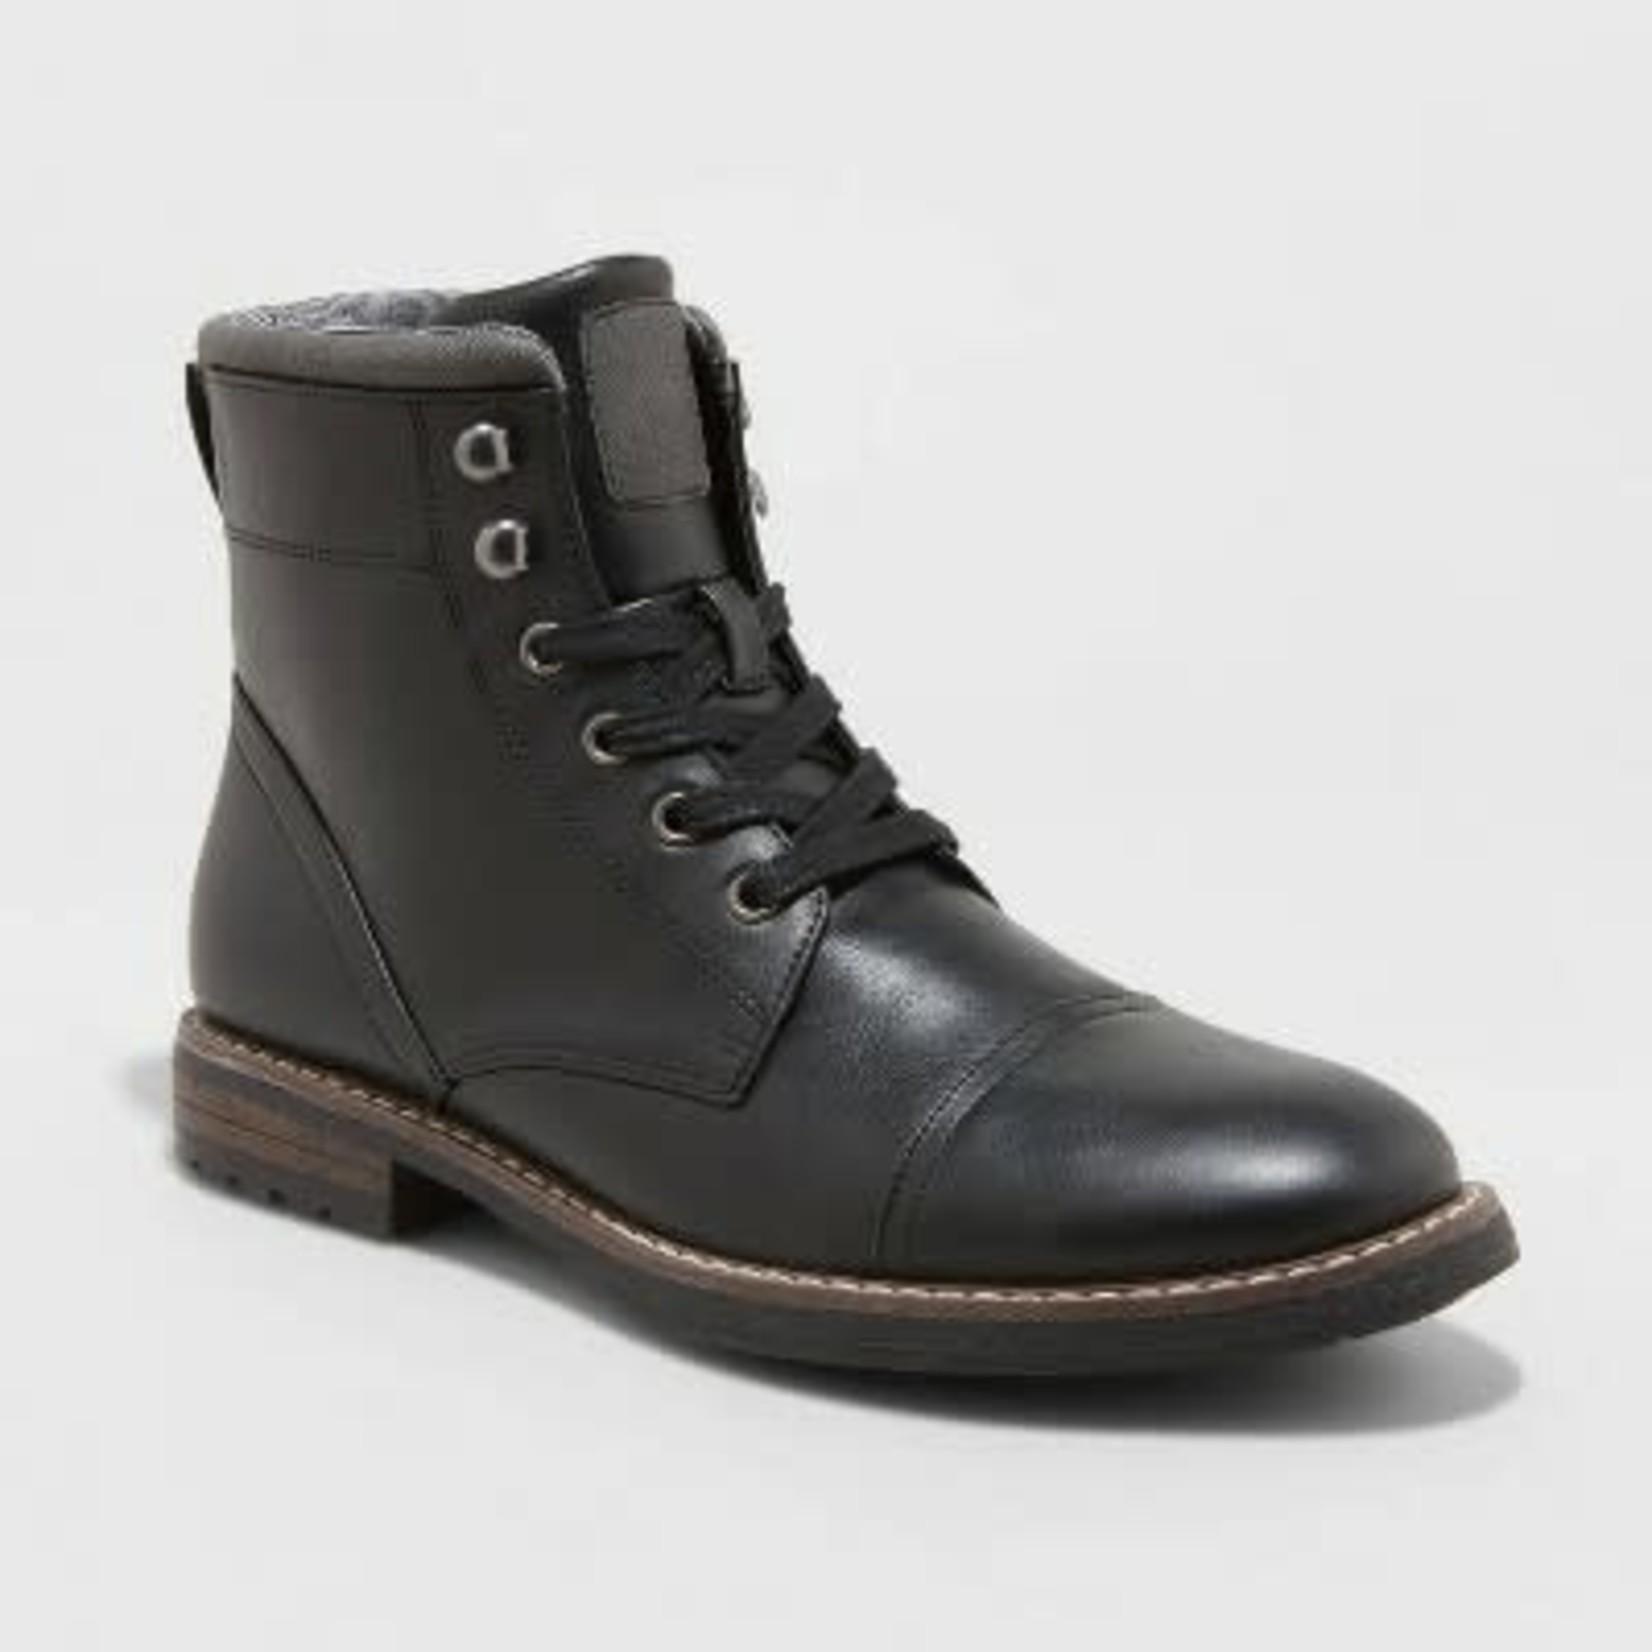 Men's Jeffrey Cap Toe Combat Boots - Goodfellow & Co- black - 9